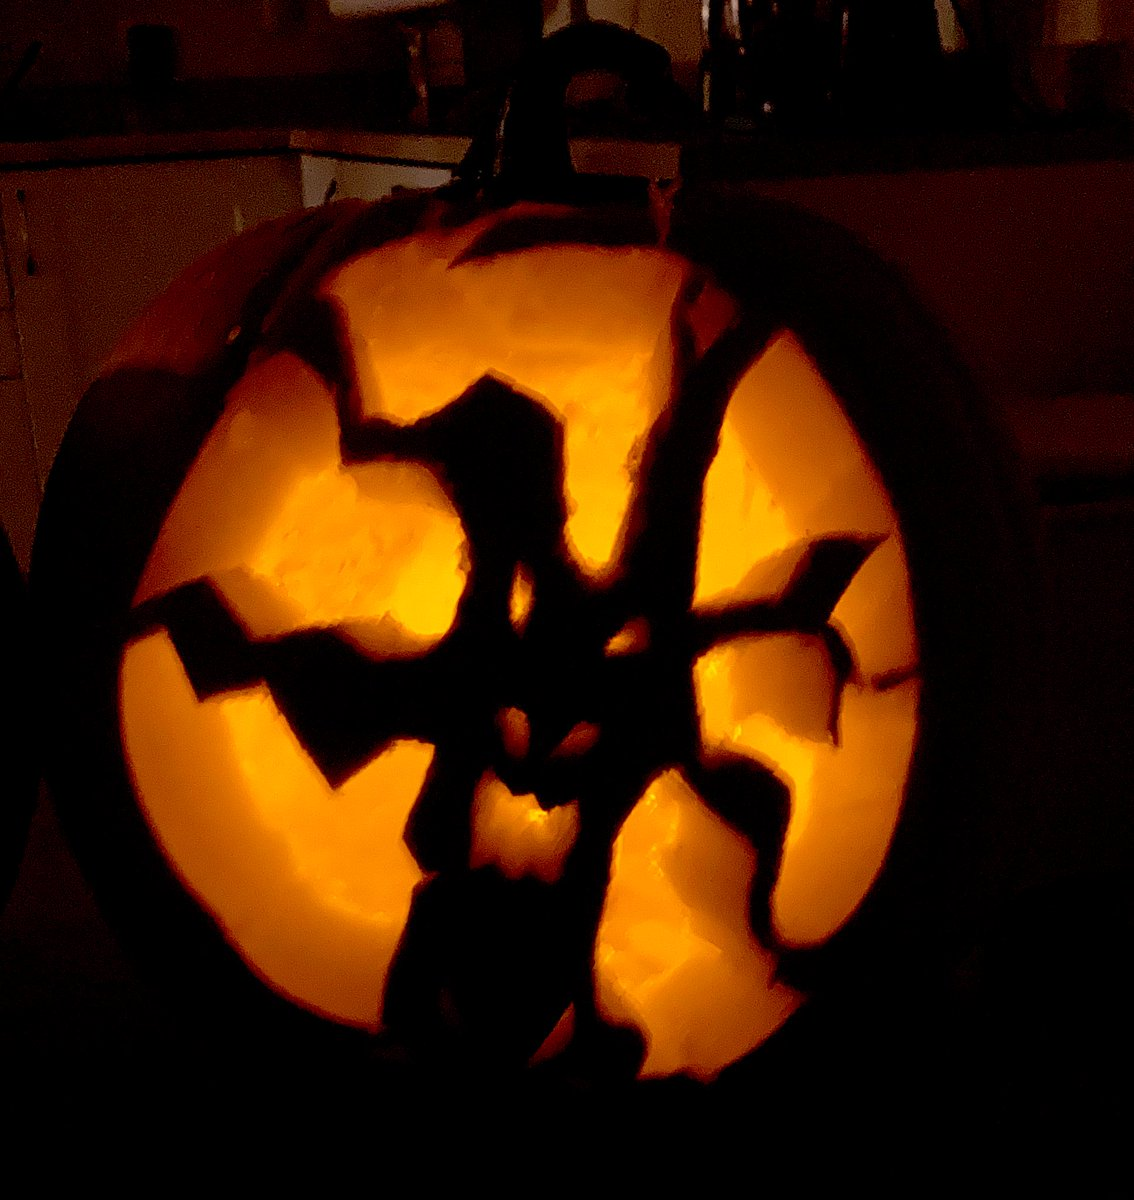 I'm having Halloween withdrawals! My pumpkin was 🔥 this year. #Halloween2020 #horror #HorrorFamily https://t.co/KE13NjrfO4